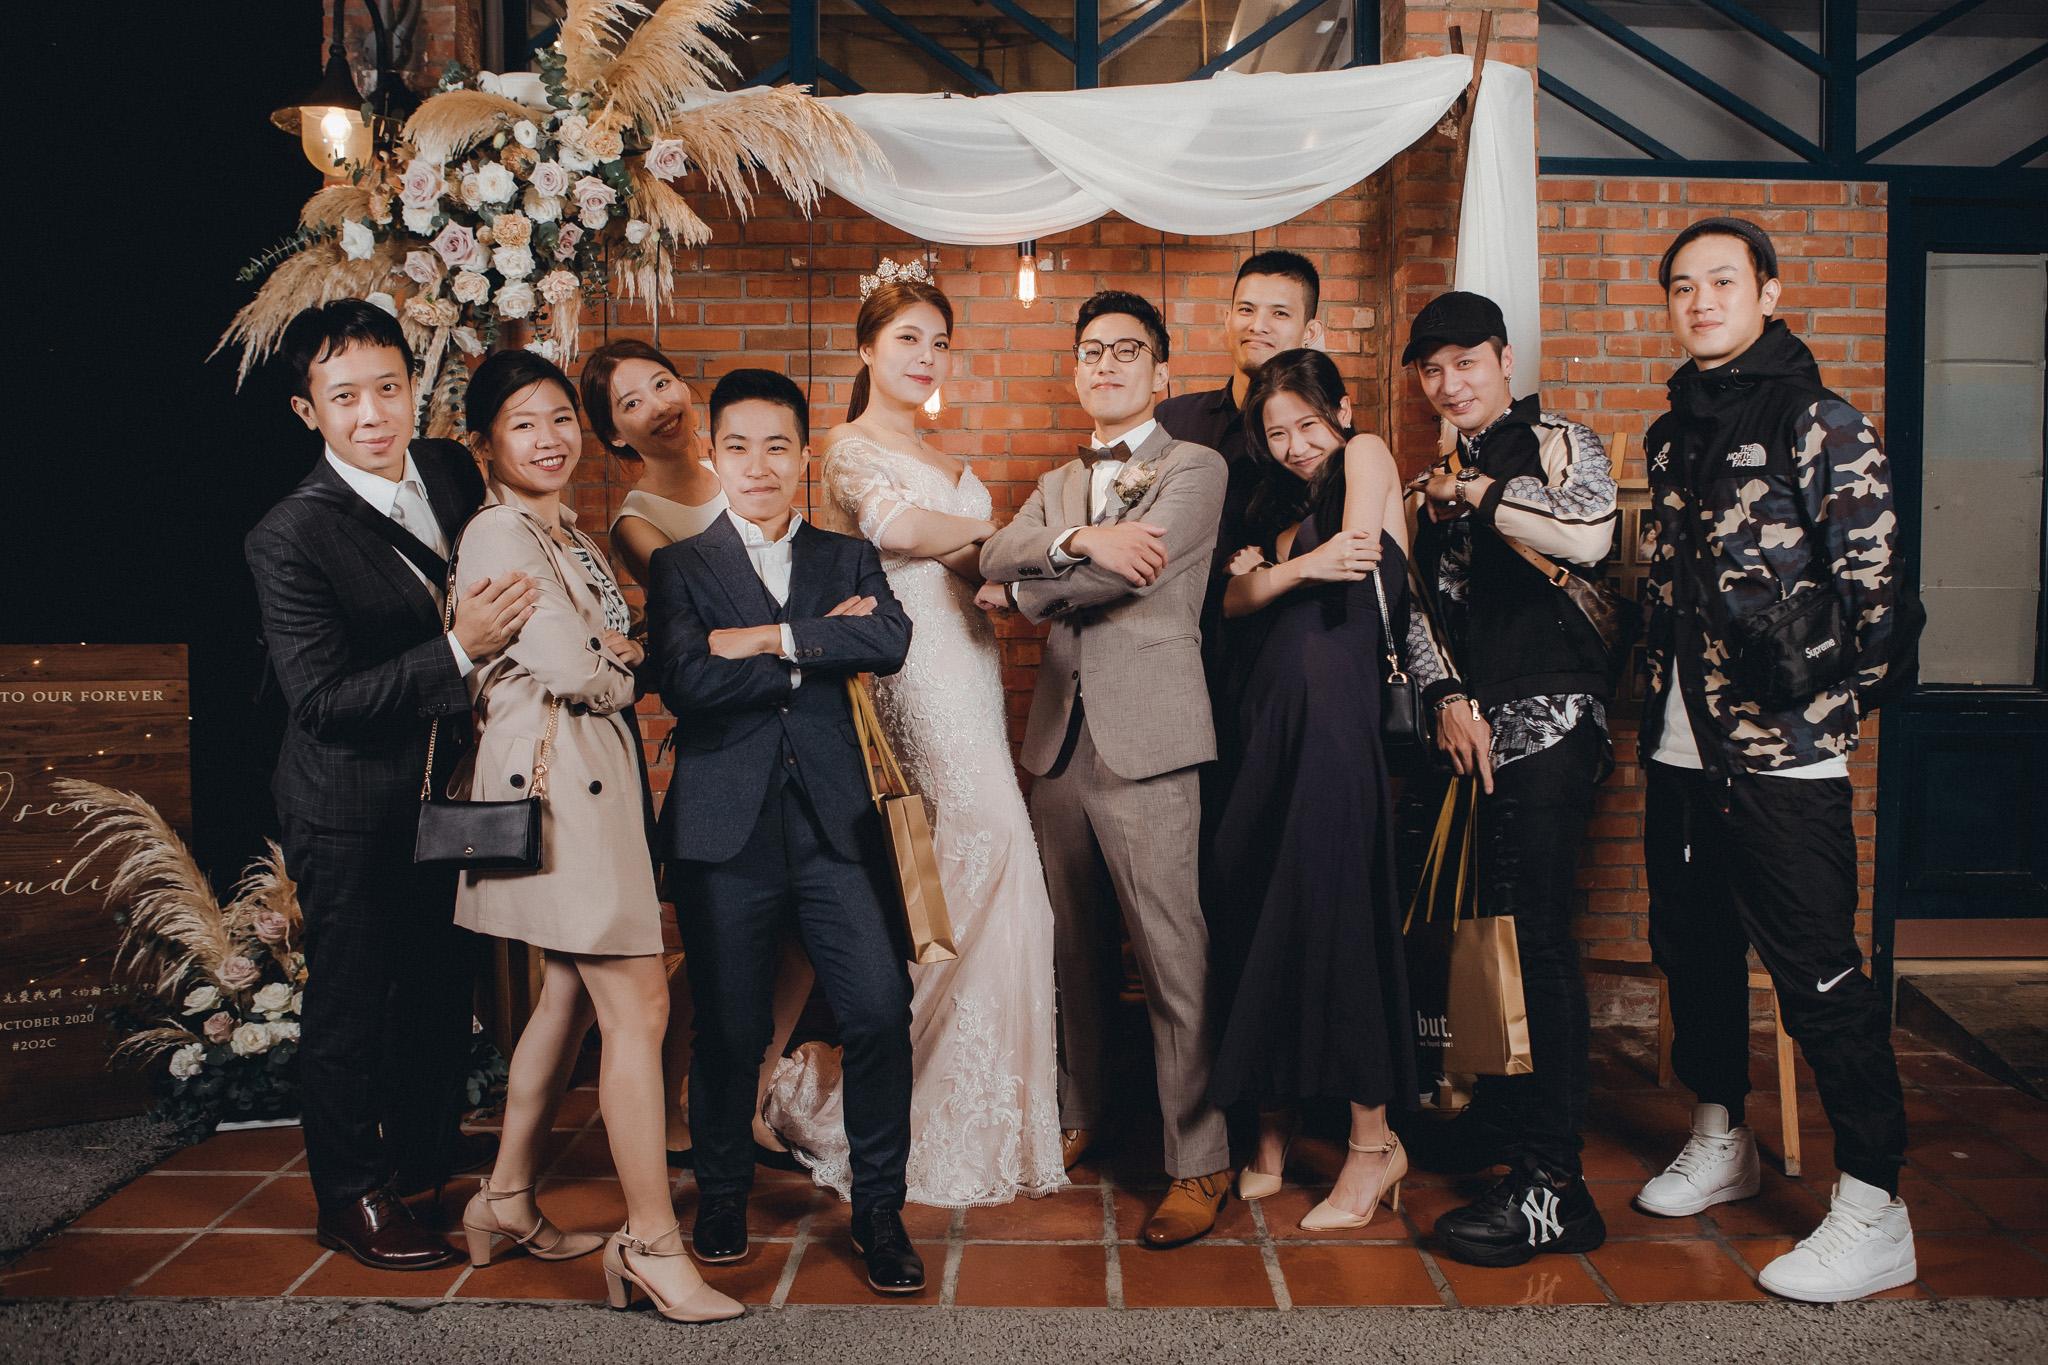 EW 台北婚攝 居米 濟南教會 Brick Yard 33 美軍俱樂部 婚禮 婚宴-111